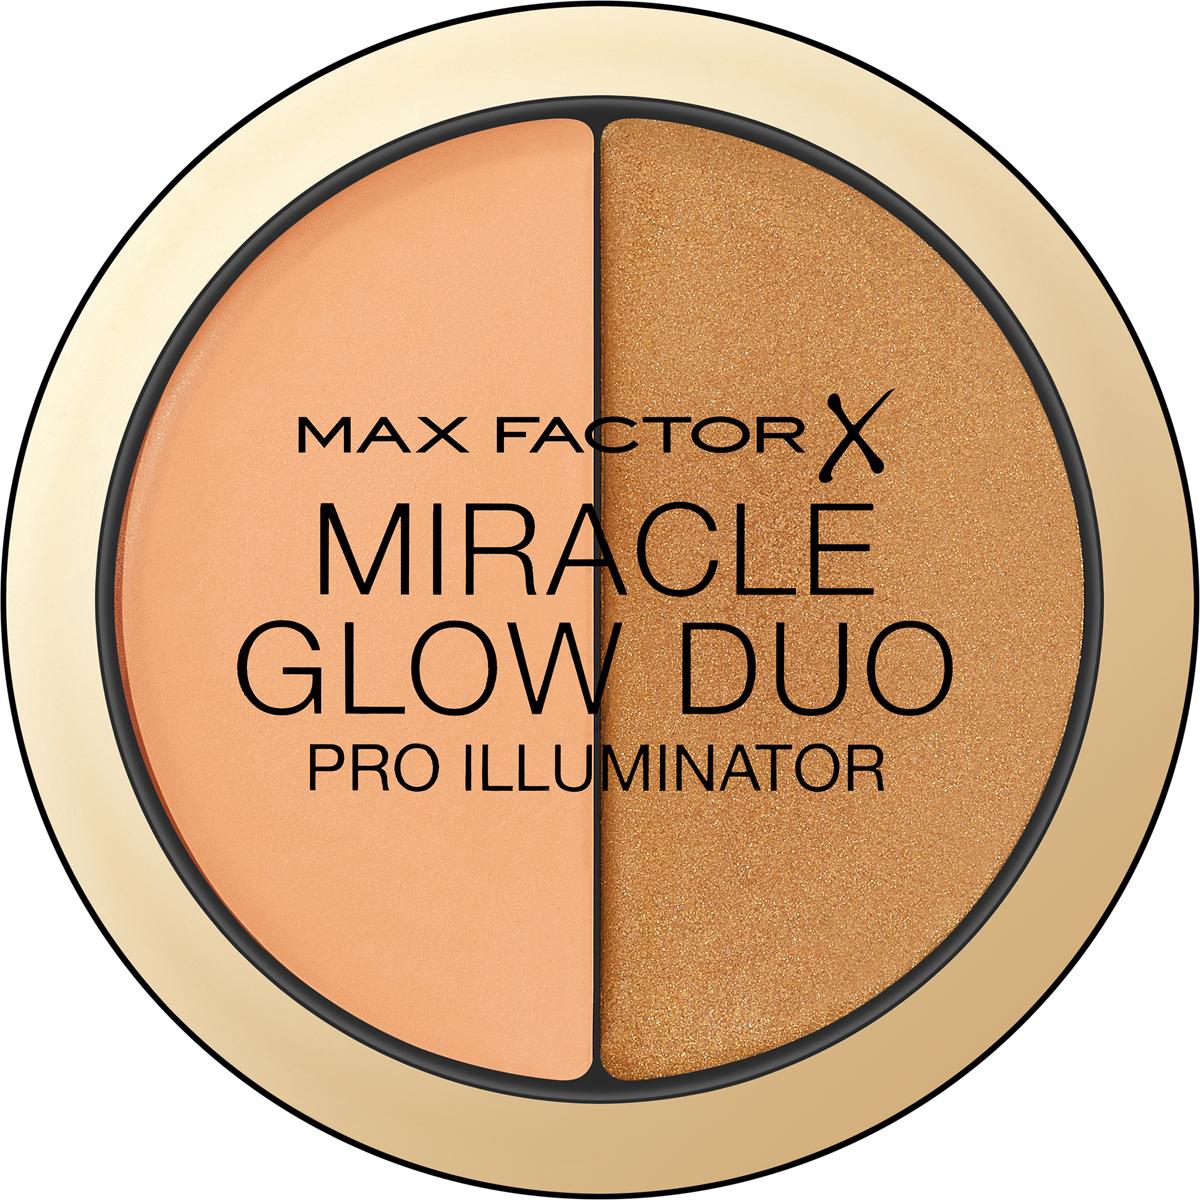 Max Factor Хайлайтер Miracle Glow Duo, тон №30 deep хайлайтер by terry glow expert duo stick 3 цвет 3 peachy petal variant hex name f89f97